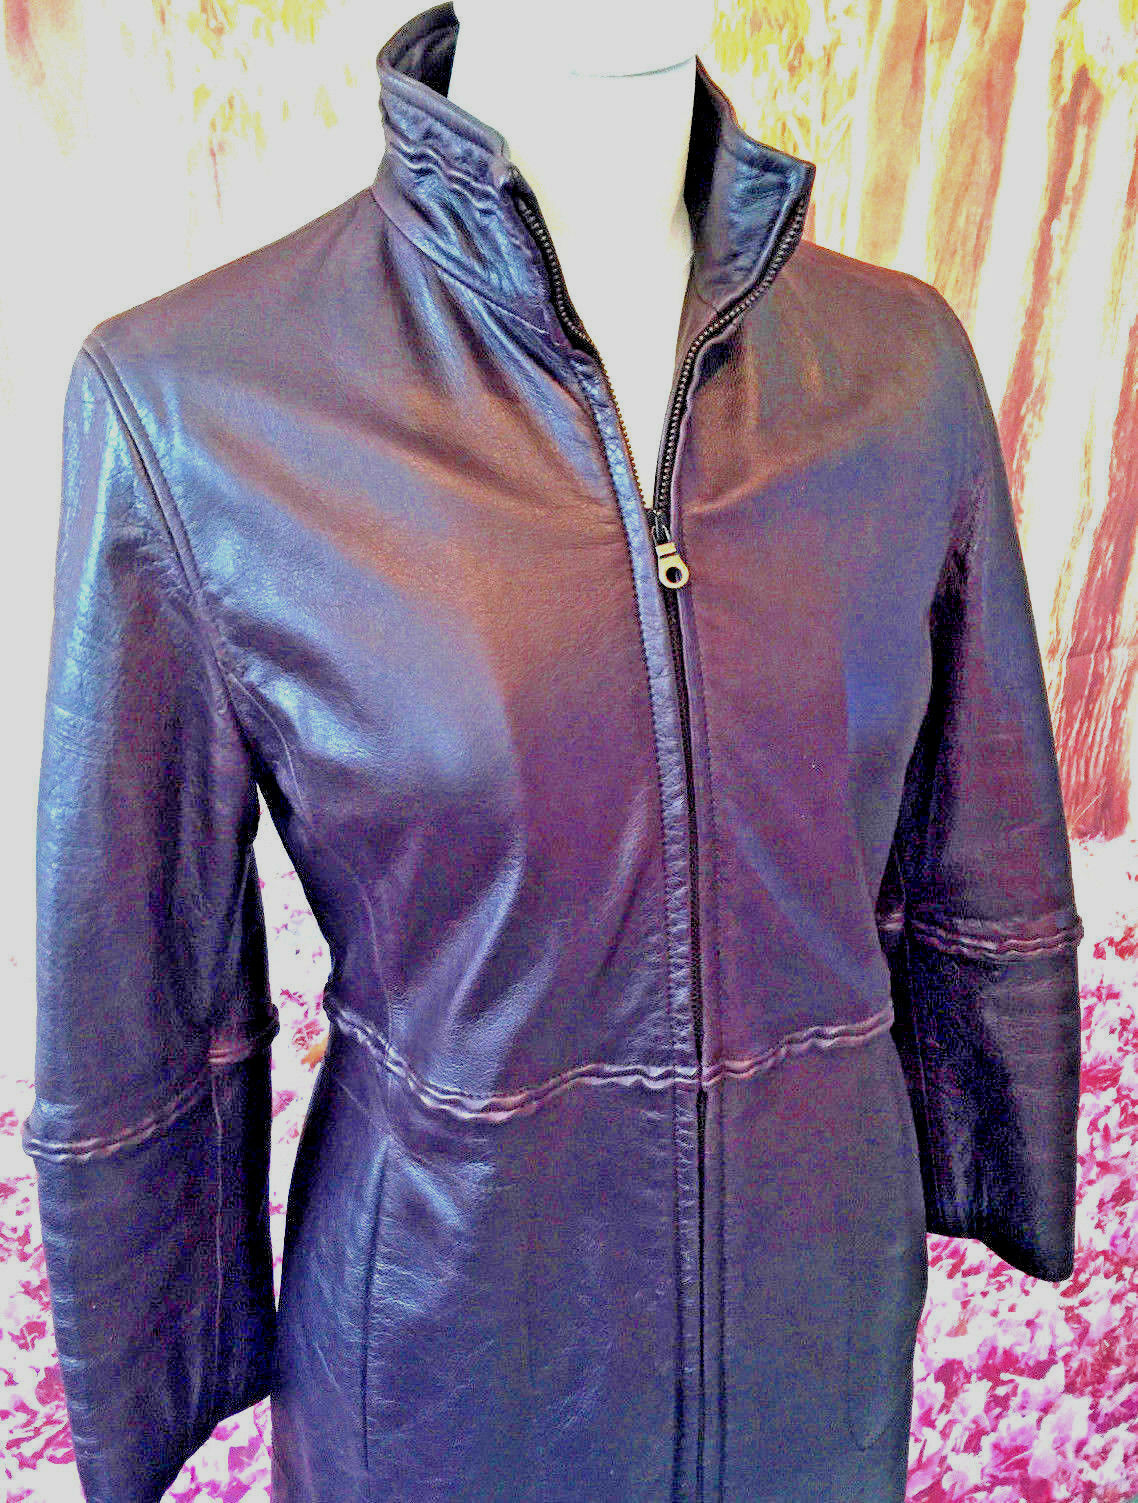 Armani real leather coat lambskin burgundy trench raincoat mac  zip 10 v